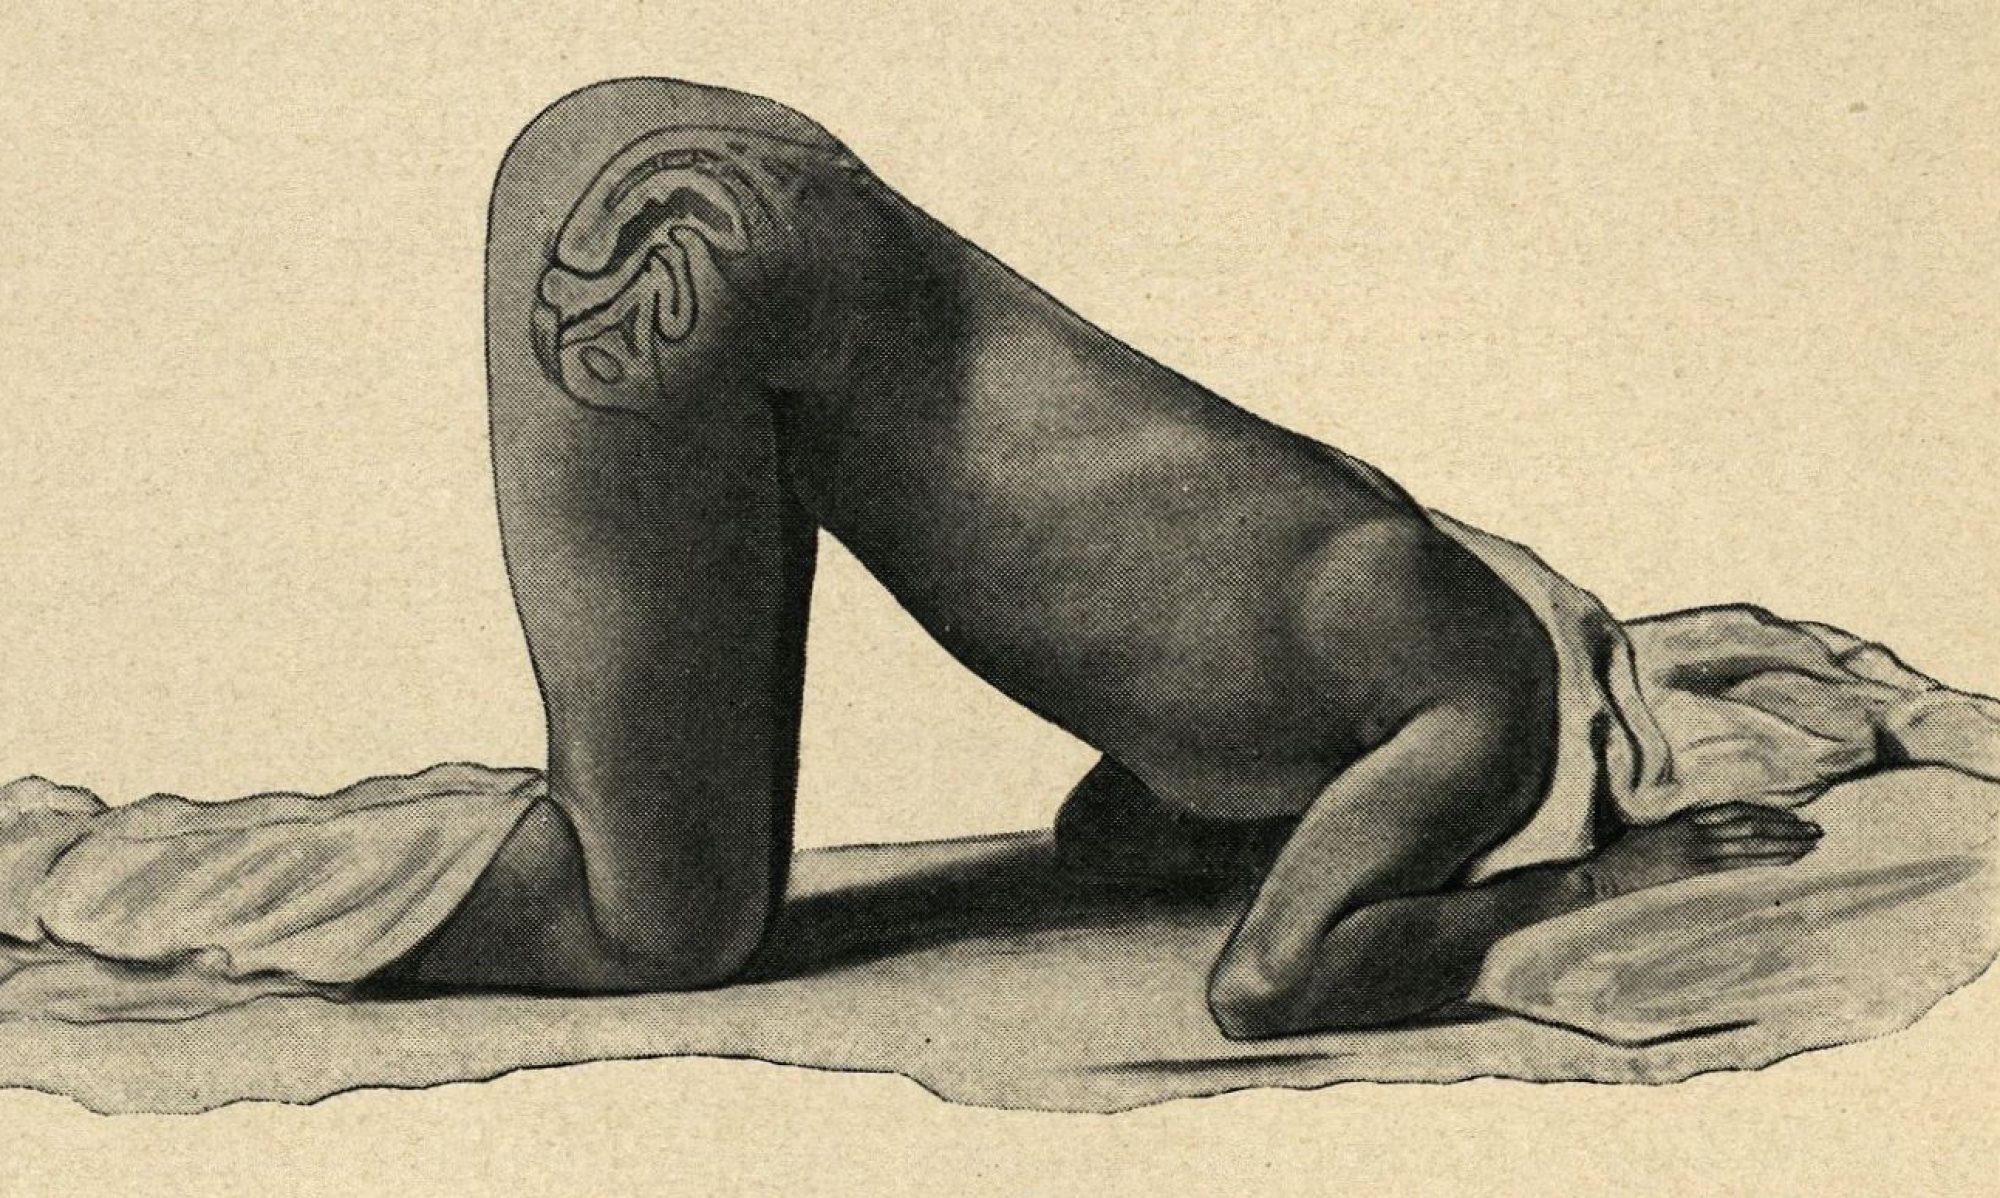 Alyson K. Spurgas